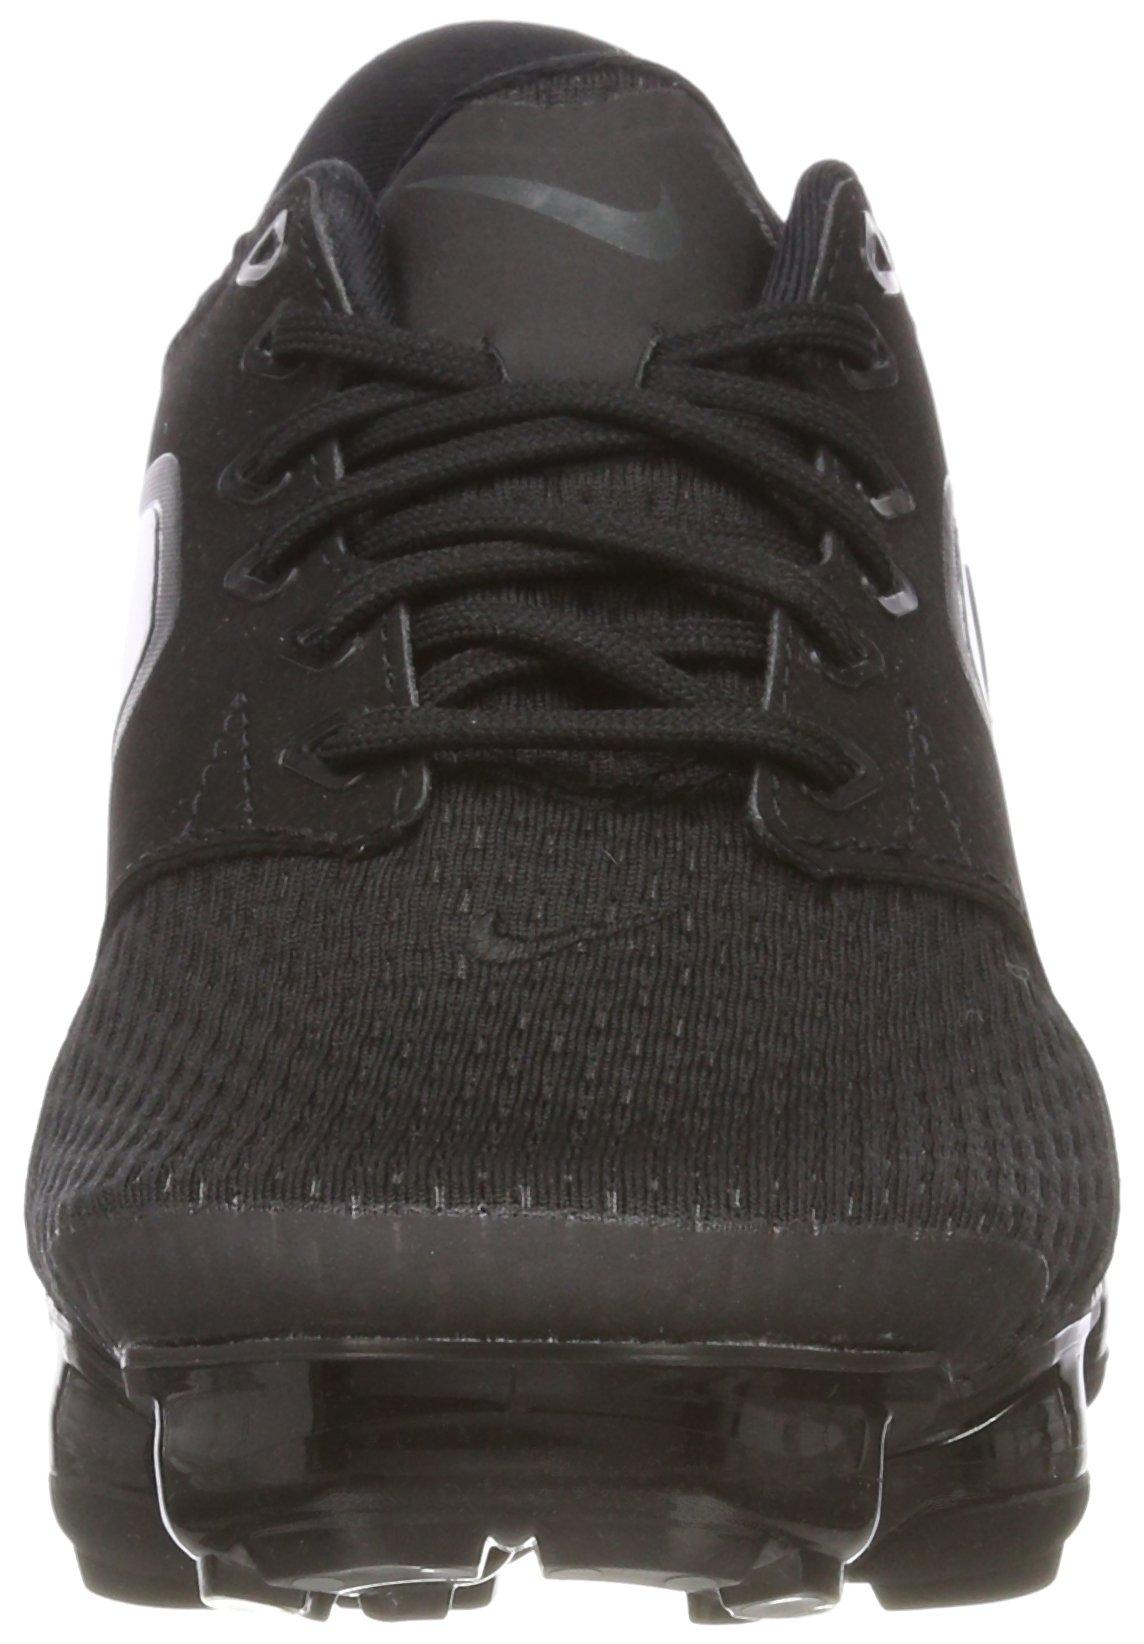 Nike Kids' Grade School Air Vapormax Running Shoes (7) by Nike (Image #4)